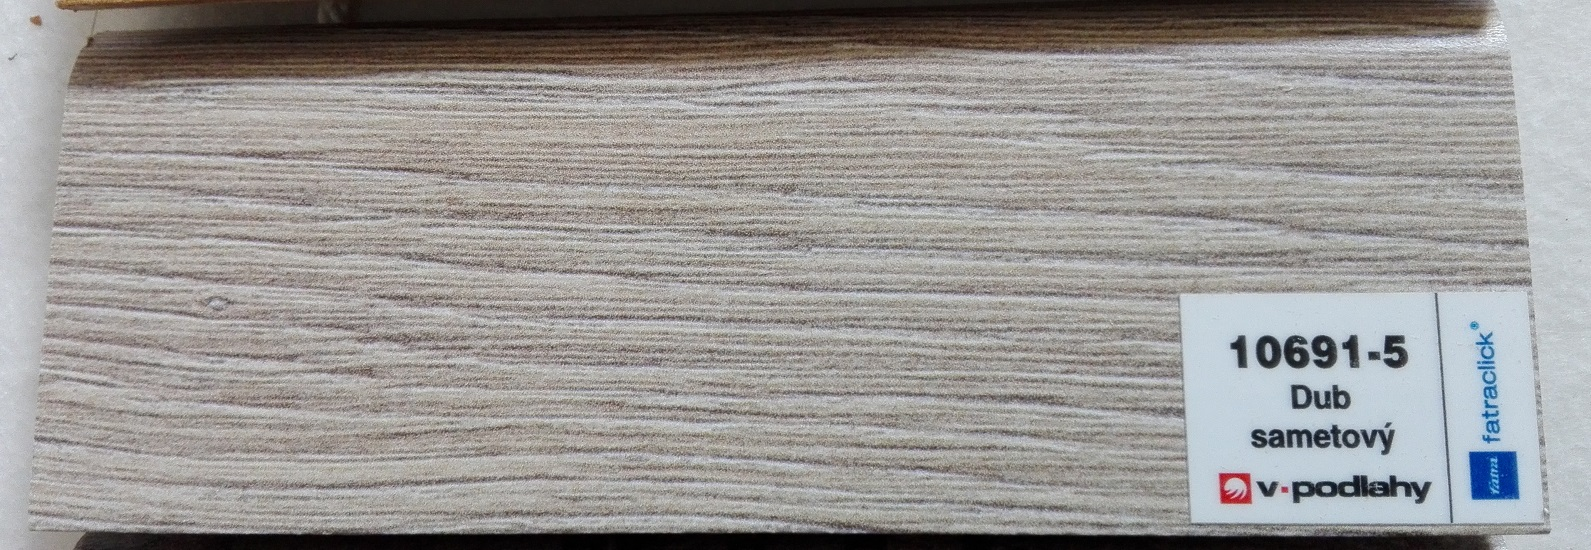 FatraClick soklová lišta Dub Sametový 10691-5